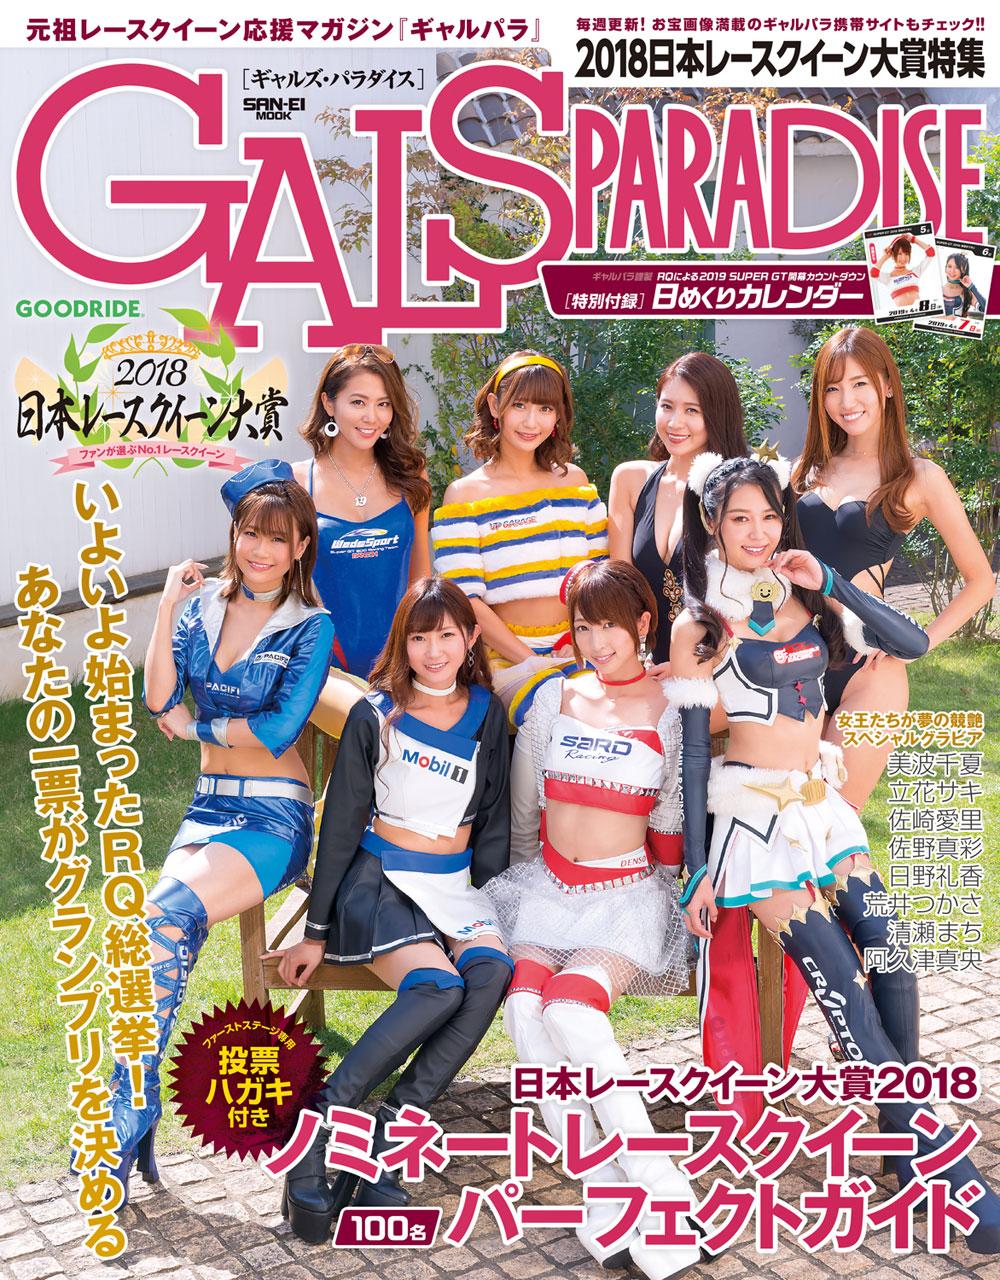 GALS PARADICE | GALS PARADISE 2018 日本レースクイーン大賞特集